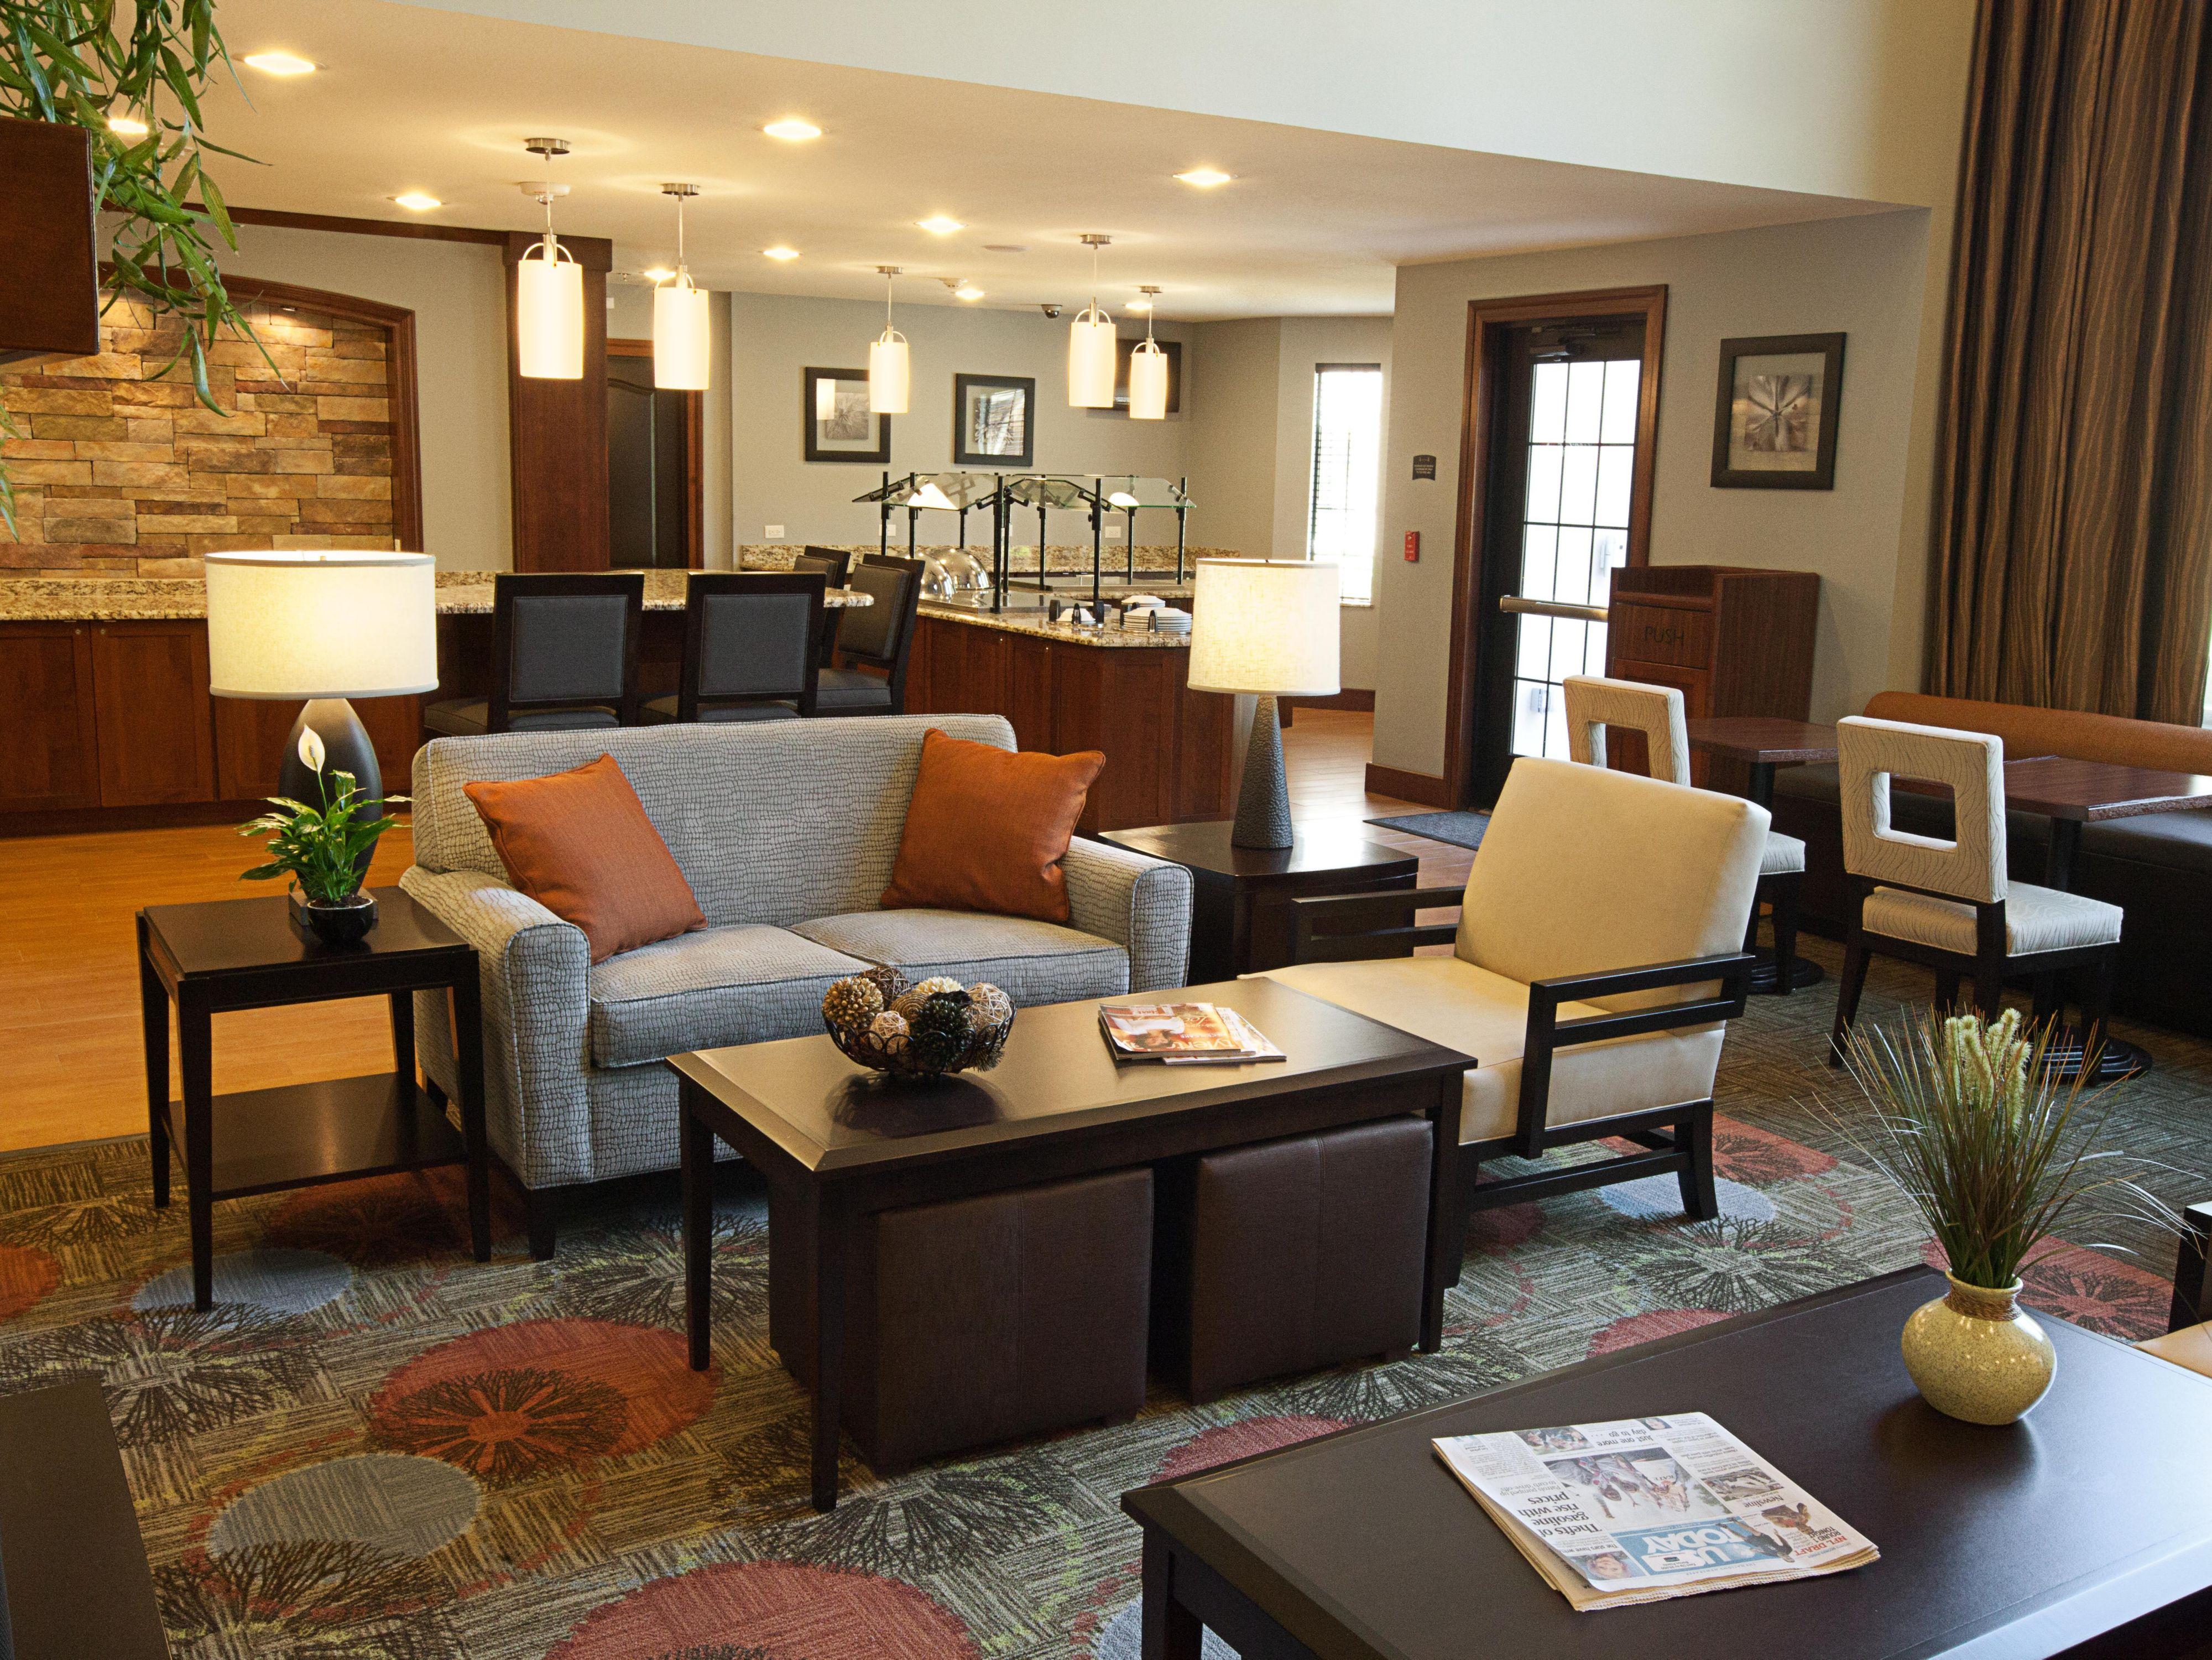 Staybridge Suites Littleton - Free Internet & Breakfast